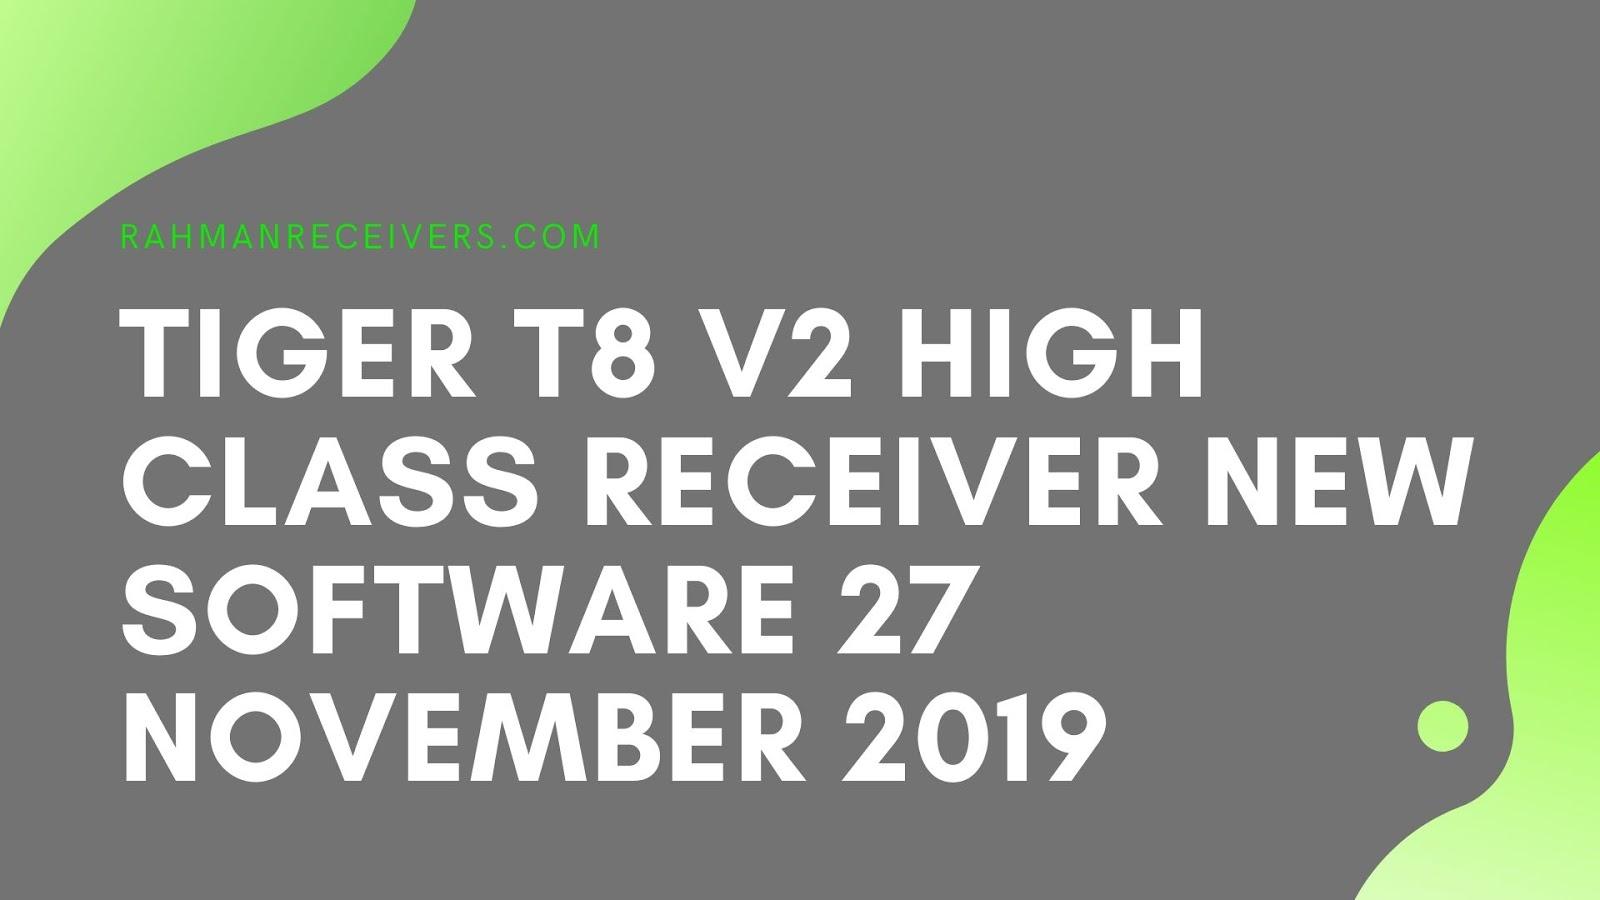 TIGER T8 V2 HIGH CLASS RECEIVER NEW SOFTWARE 27 NOVEMBER 2019